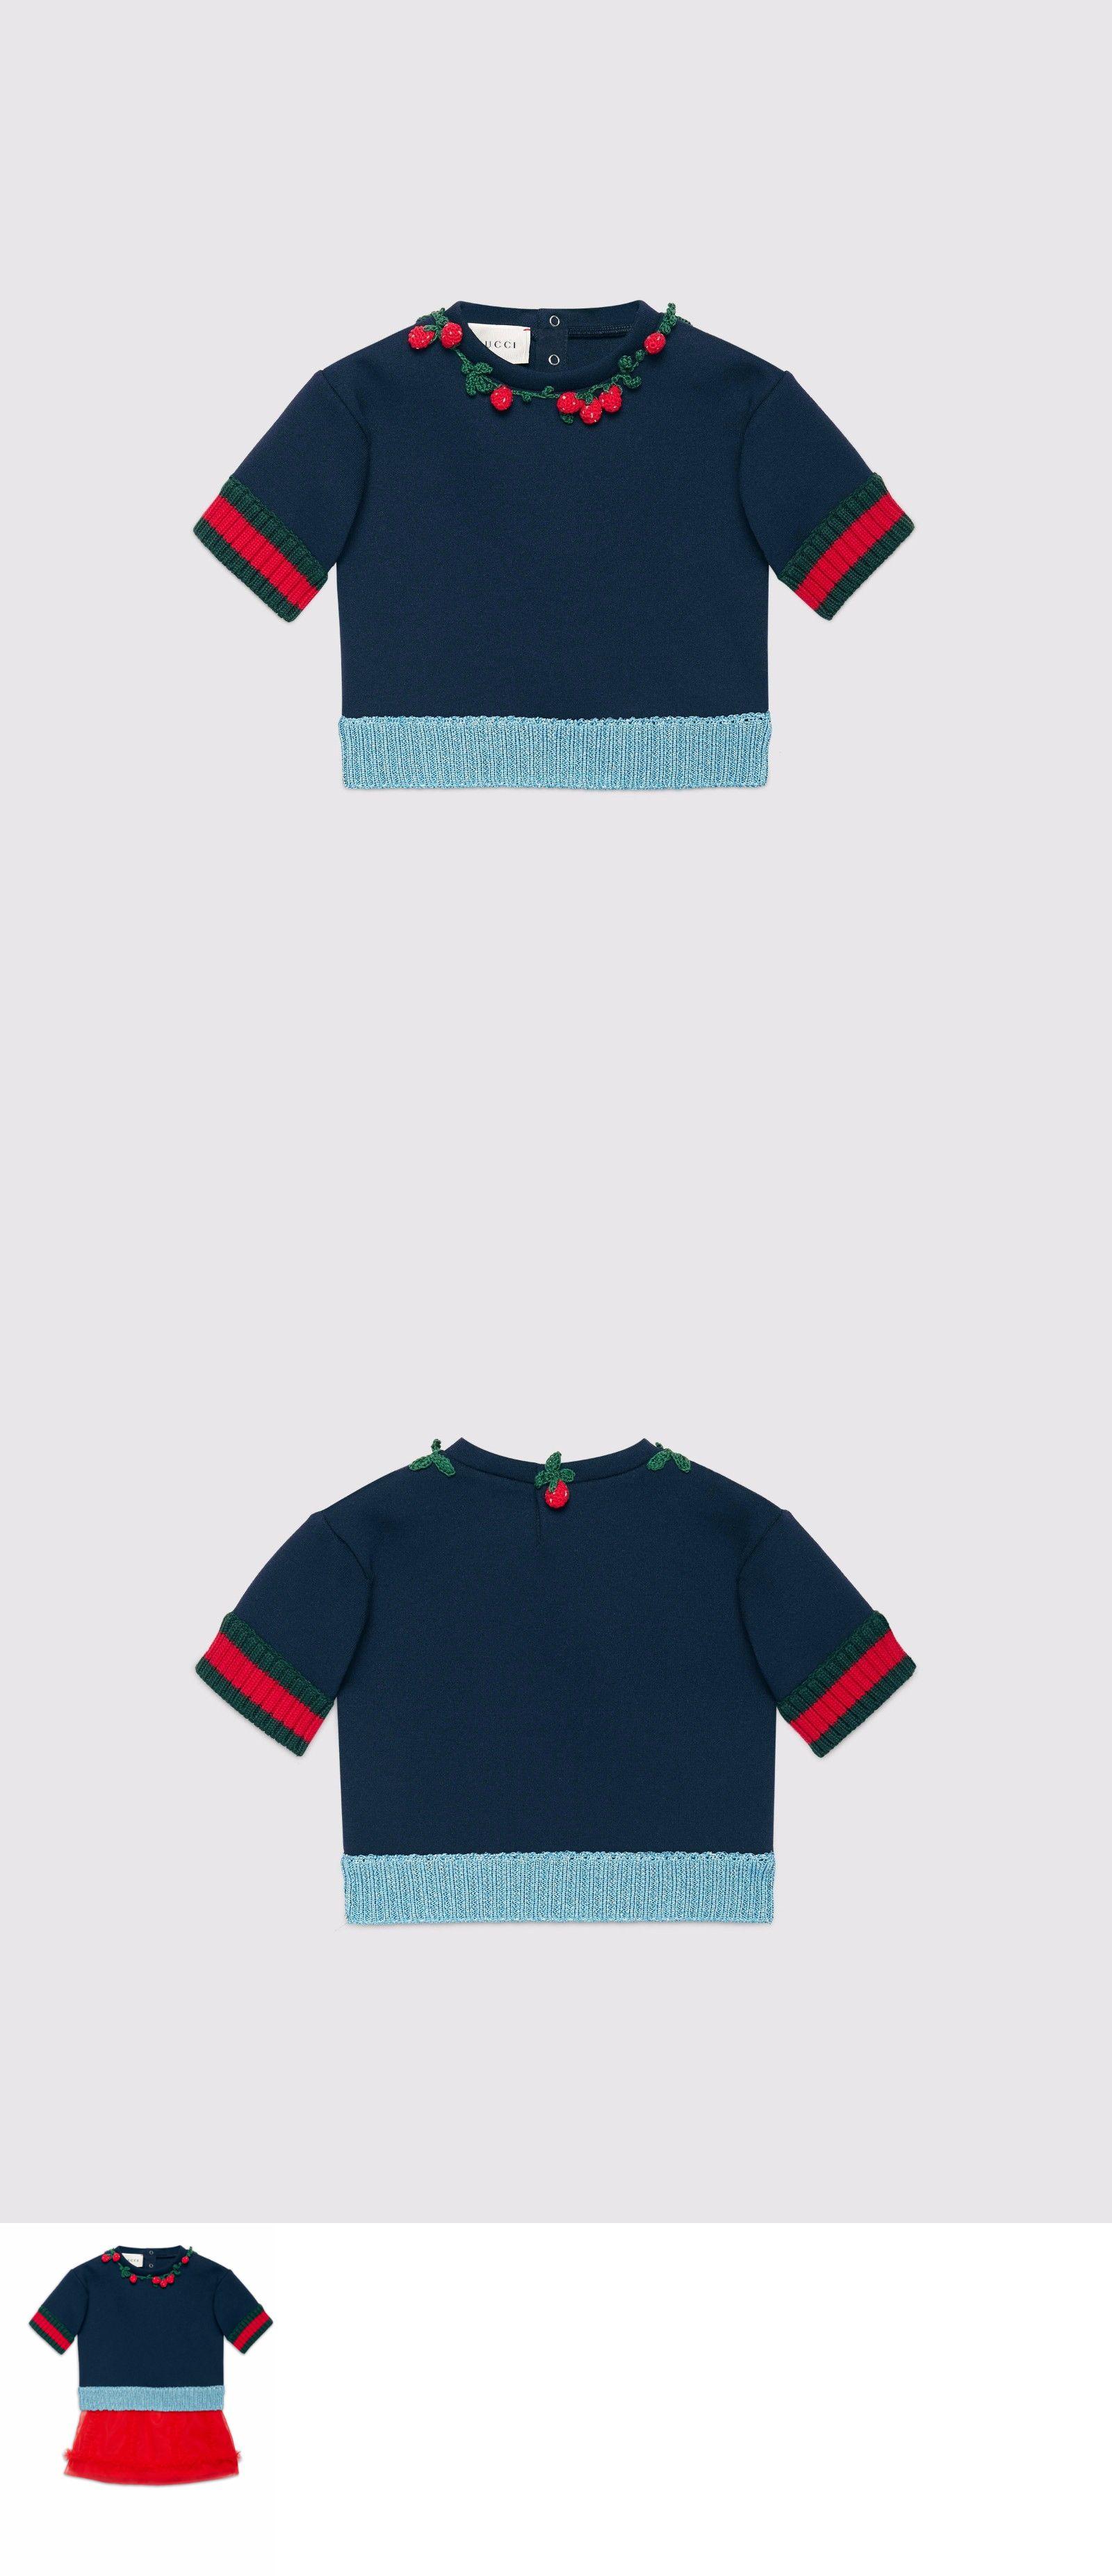 78391f1fcf2a Sweaters 147216  Nwt New Gucci Baby Girls Navy Blue Sweatshirt 9 12M ...